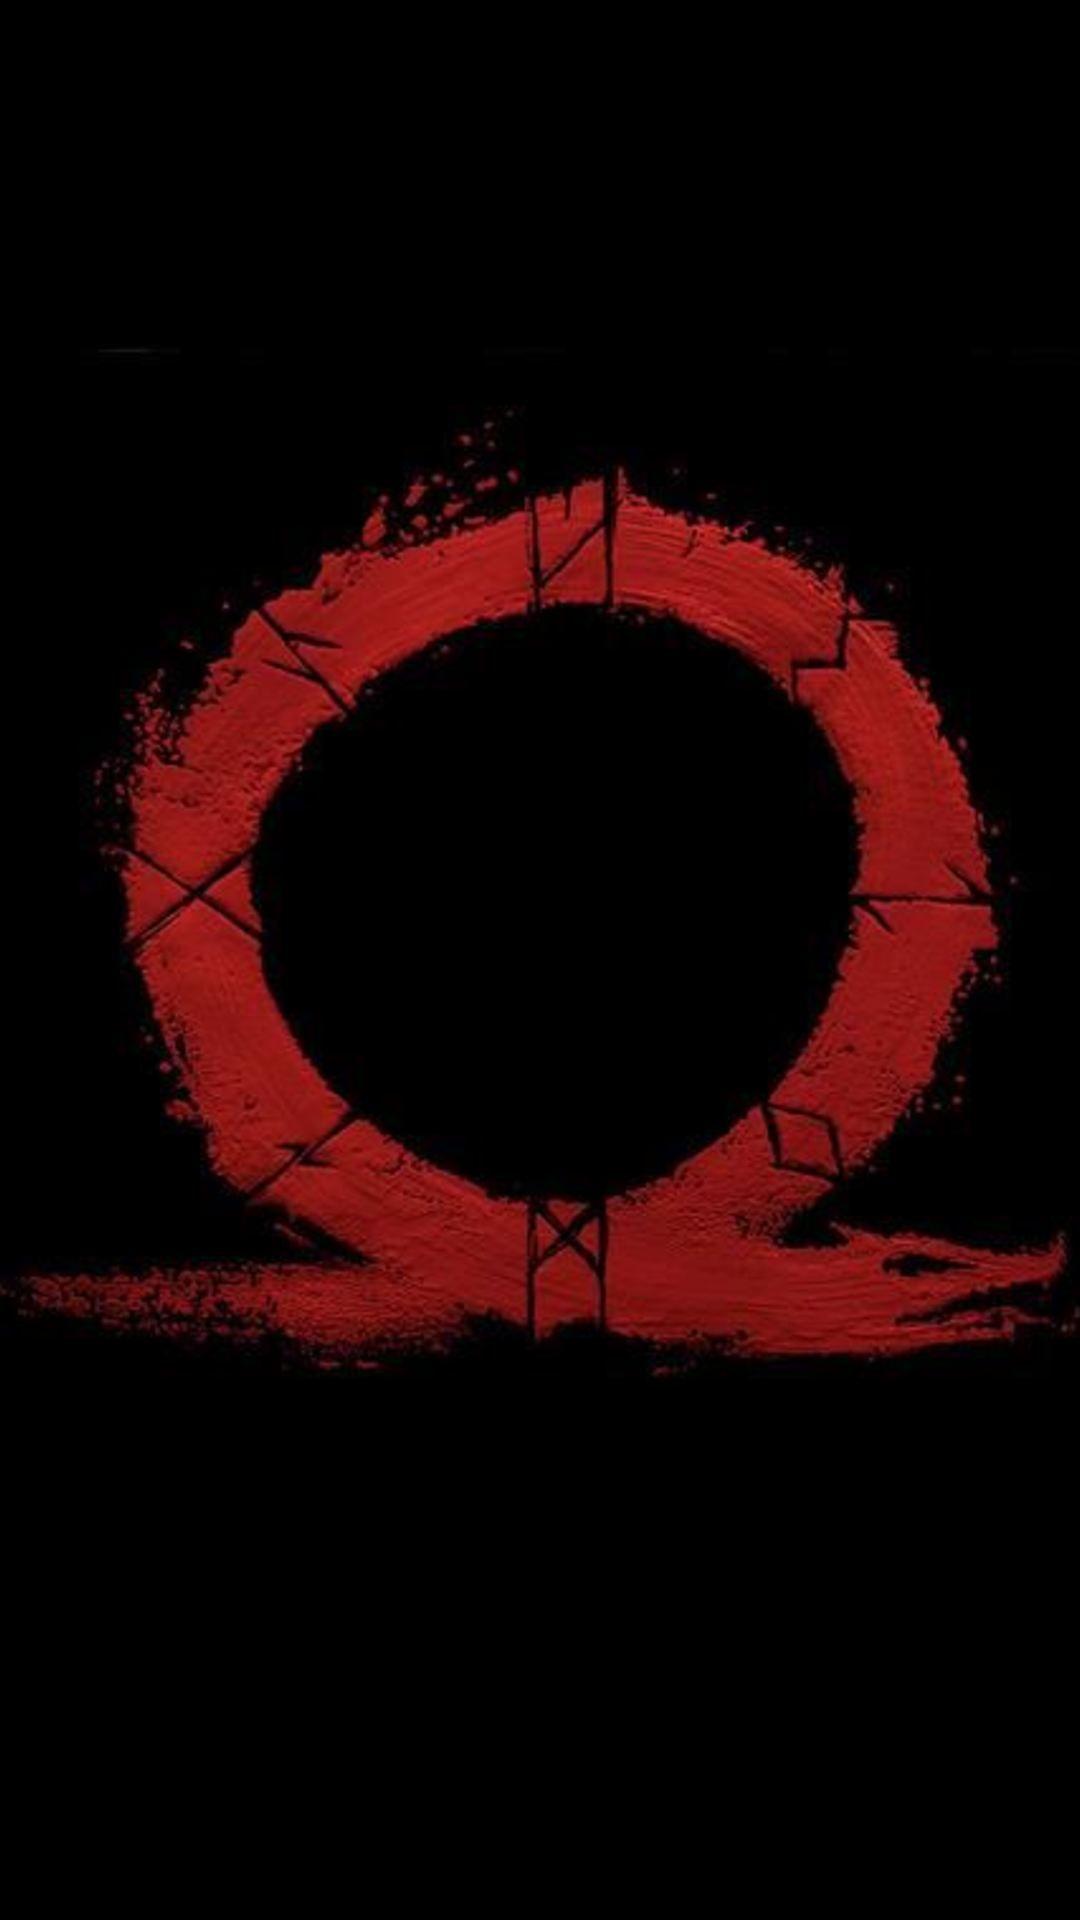 God Of War 4 New Omega Img Wallpaper 1080x1920 Kratos God Of